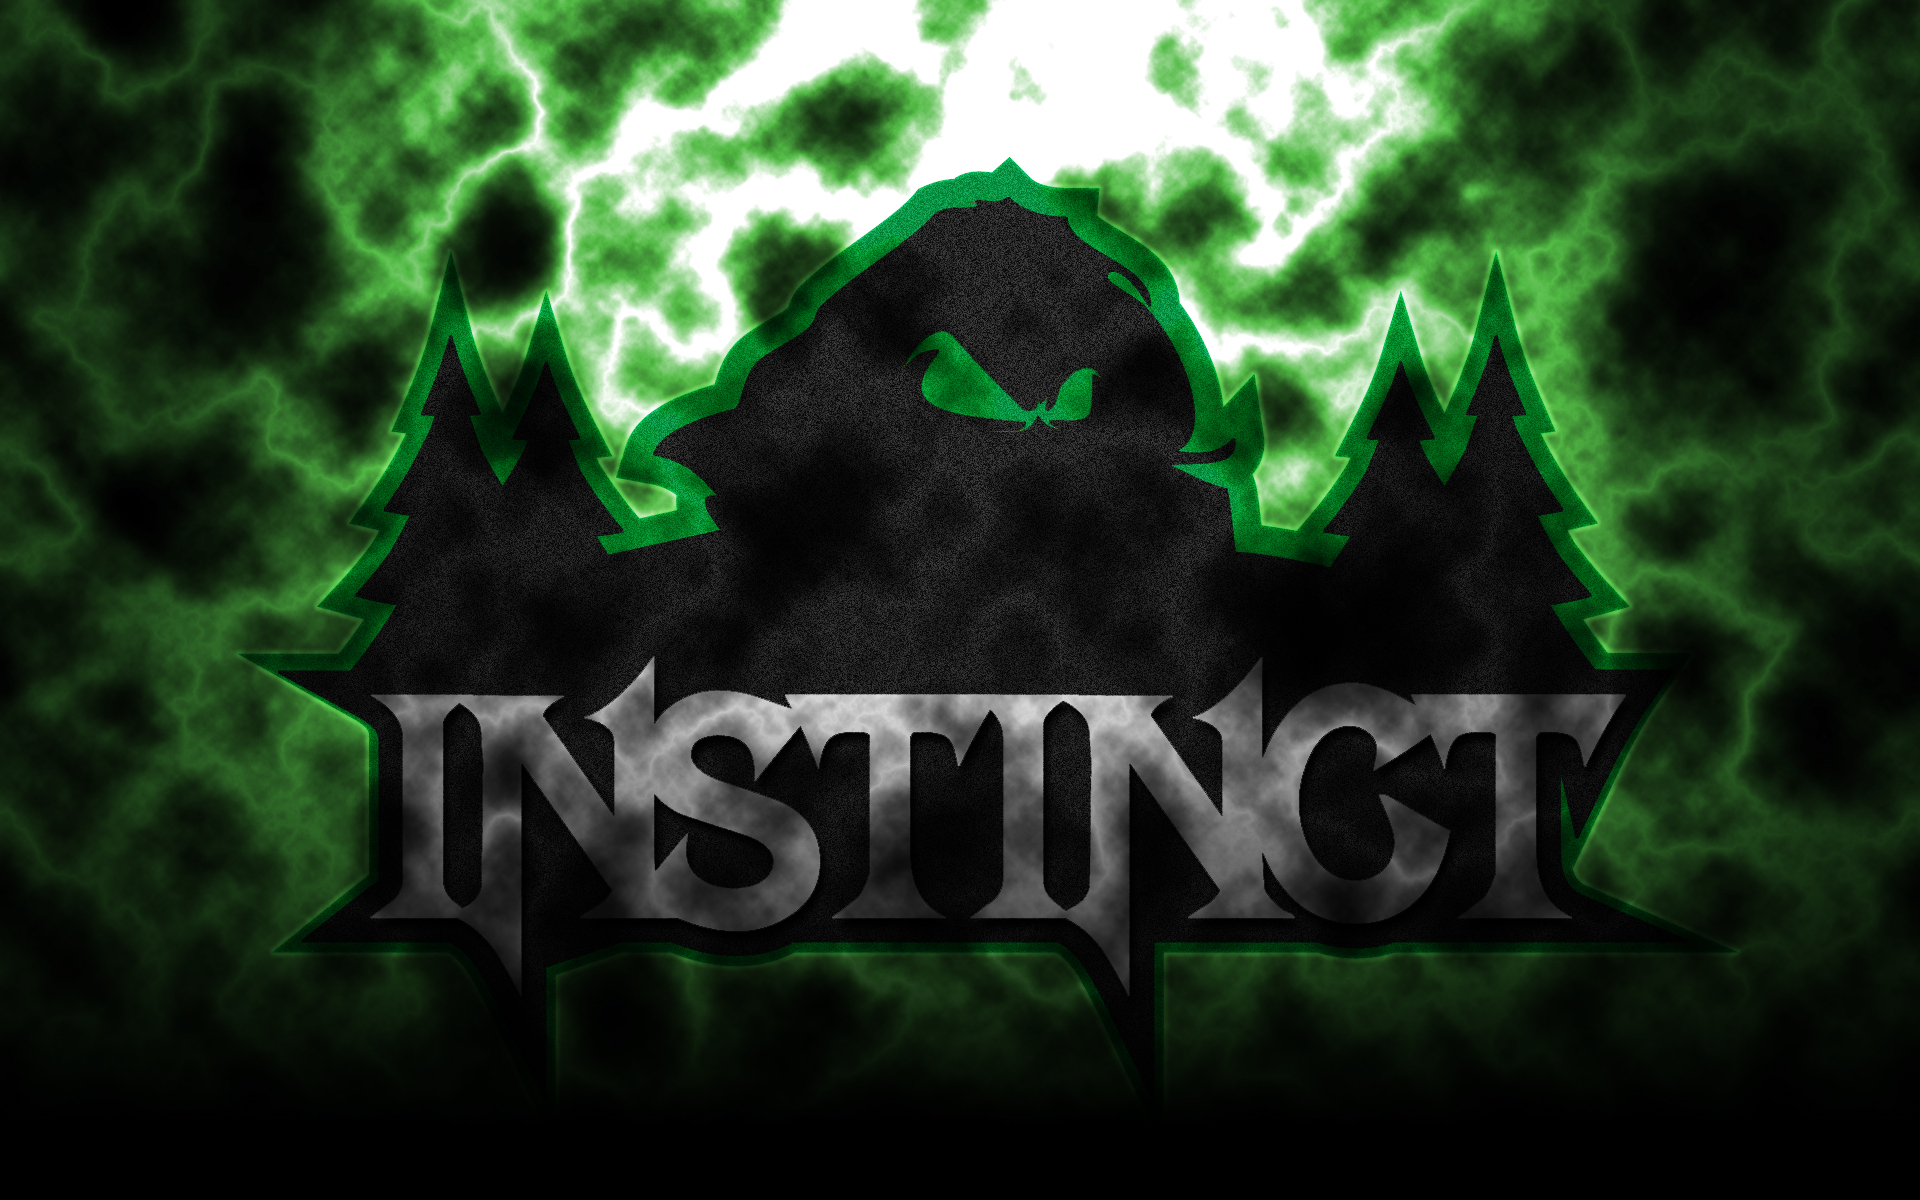 Mlg Team Logos Mlg Team Instinct by